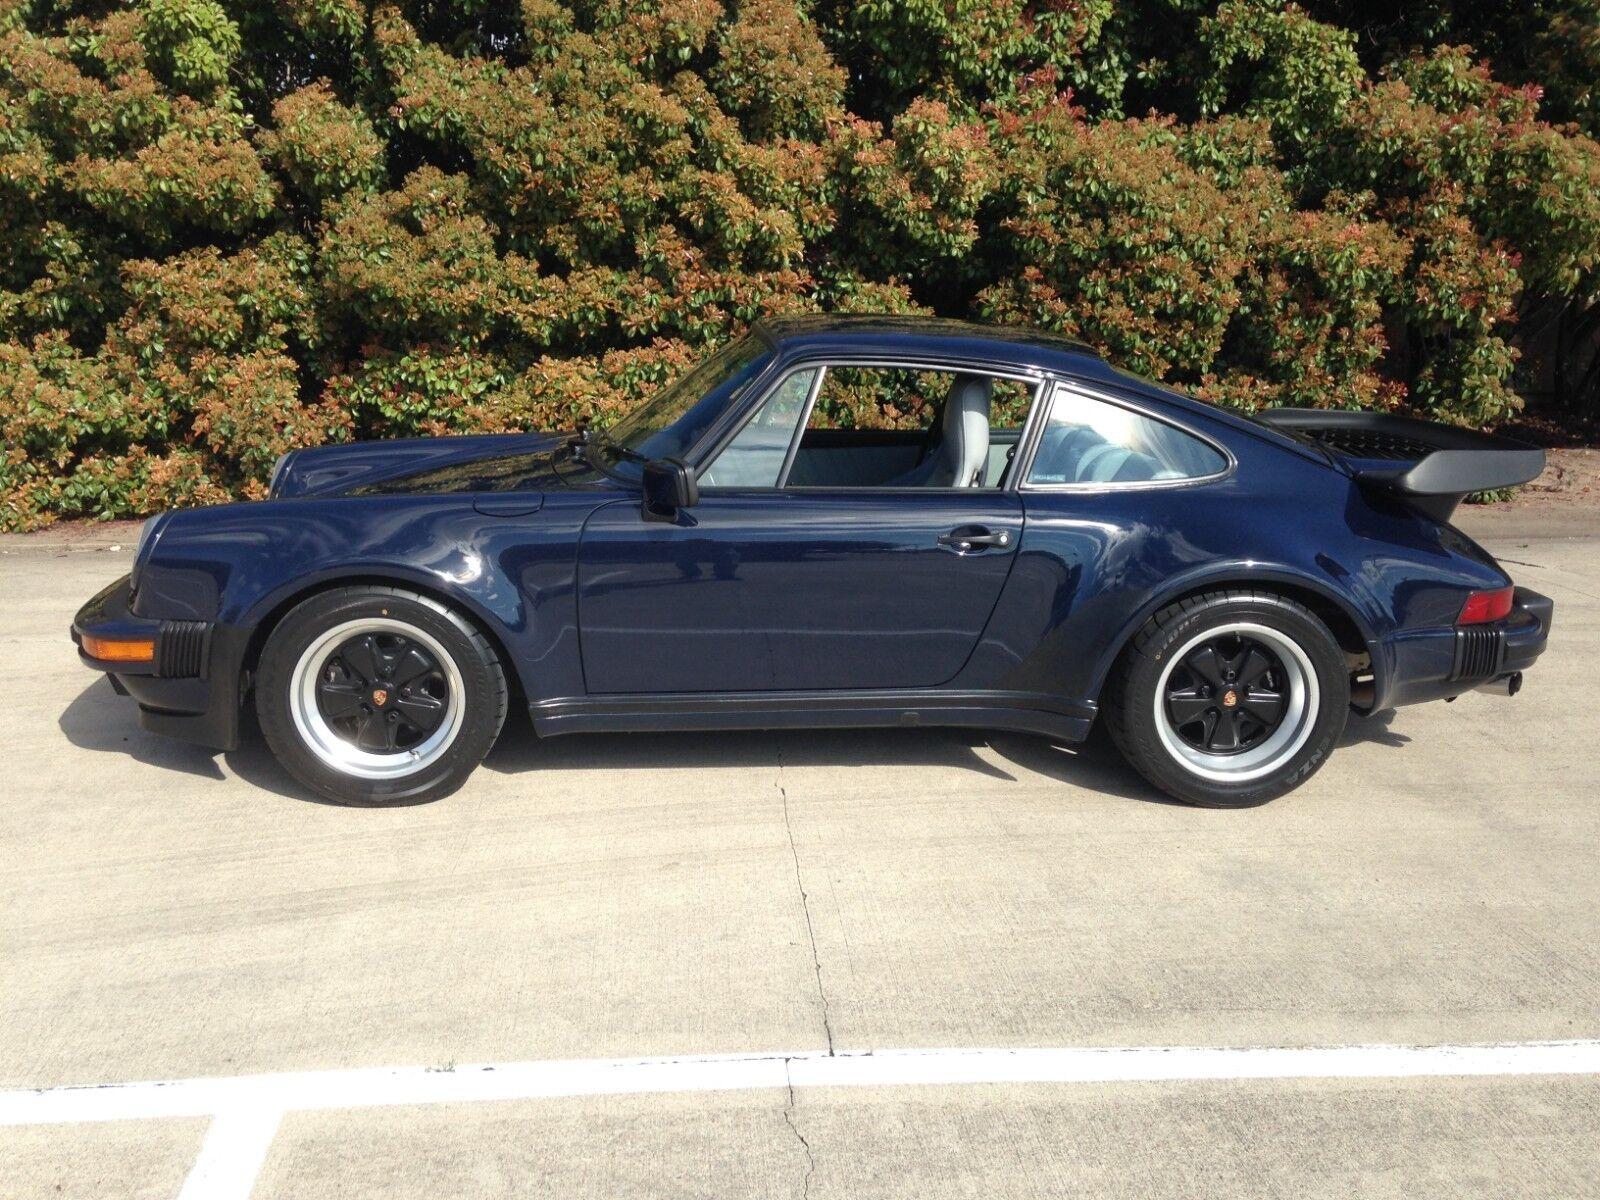 1988 Porsche 930 Turbo Beautiful 1988 930 Turbo